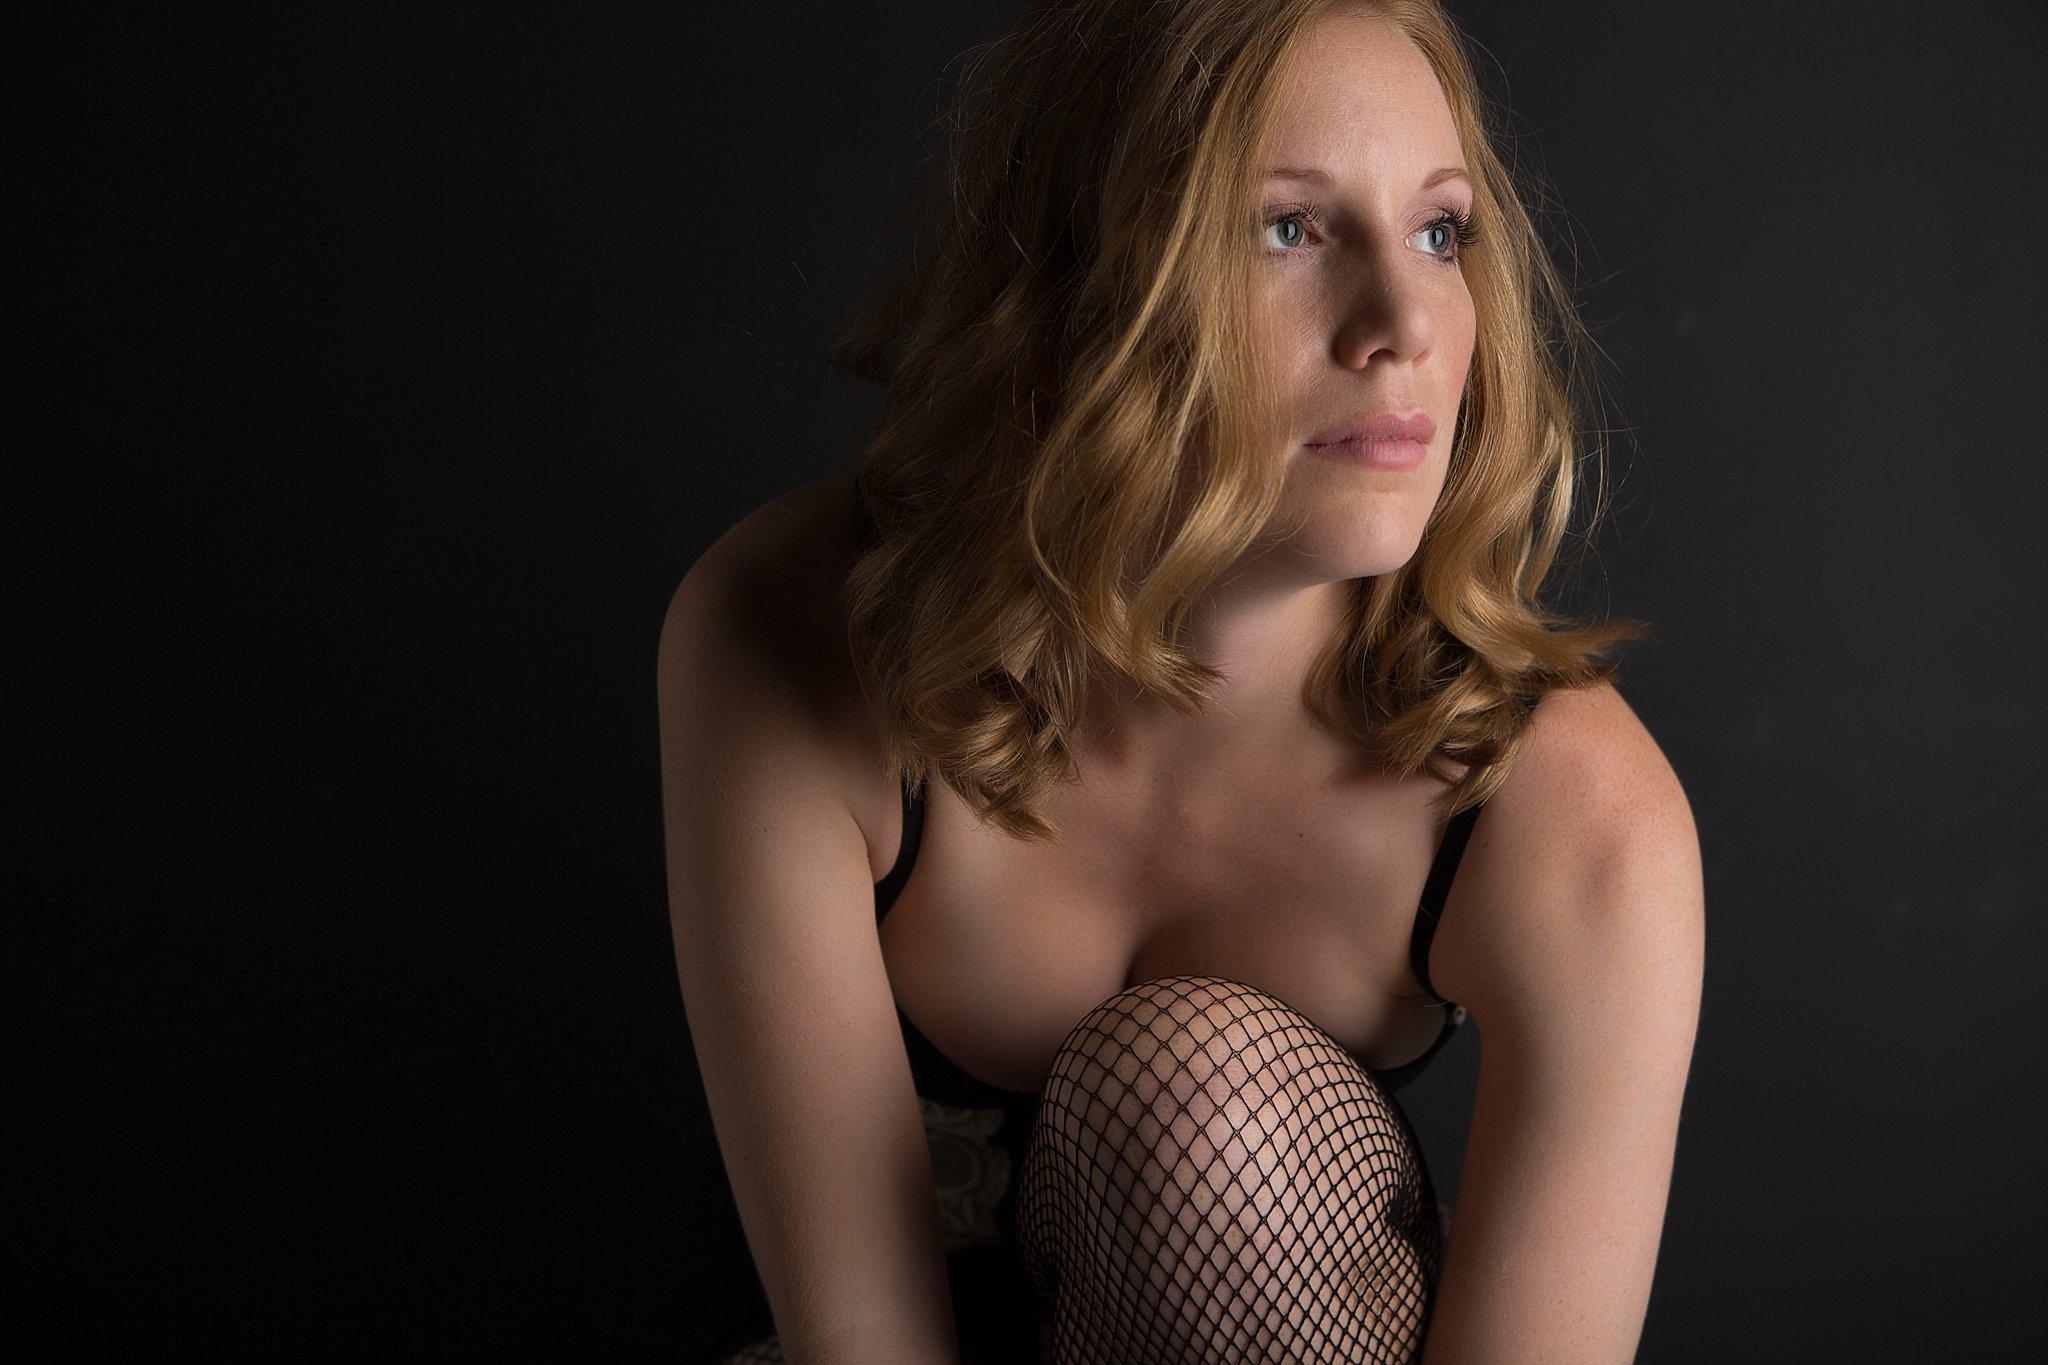 bridal boudoir portraits | Lavish Boudoir™ Valdosta